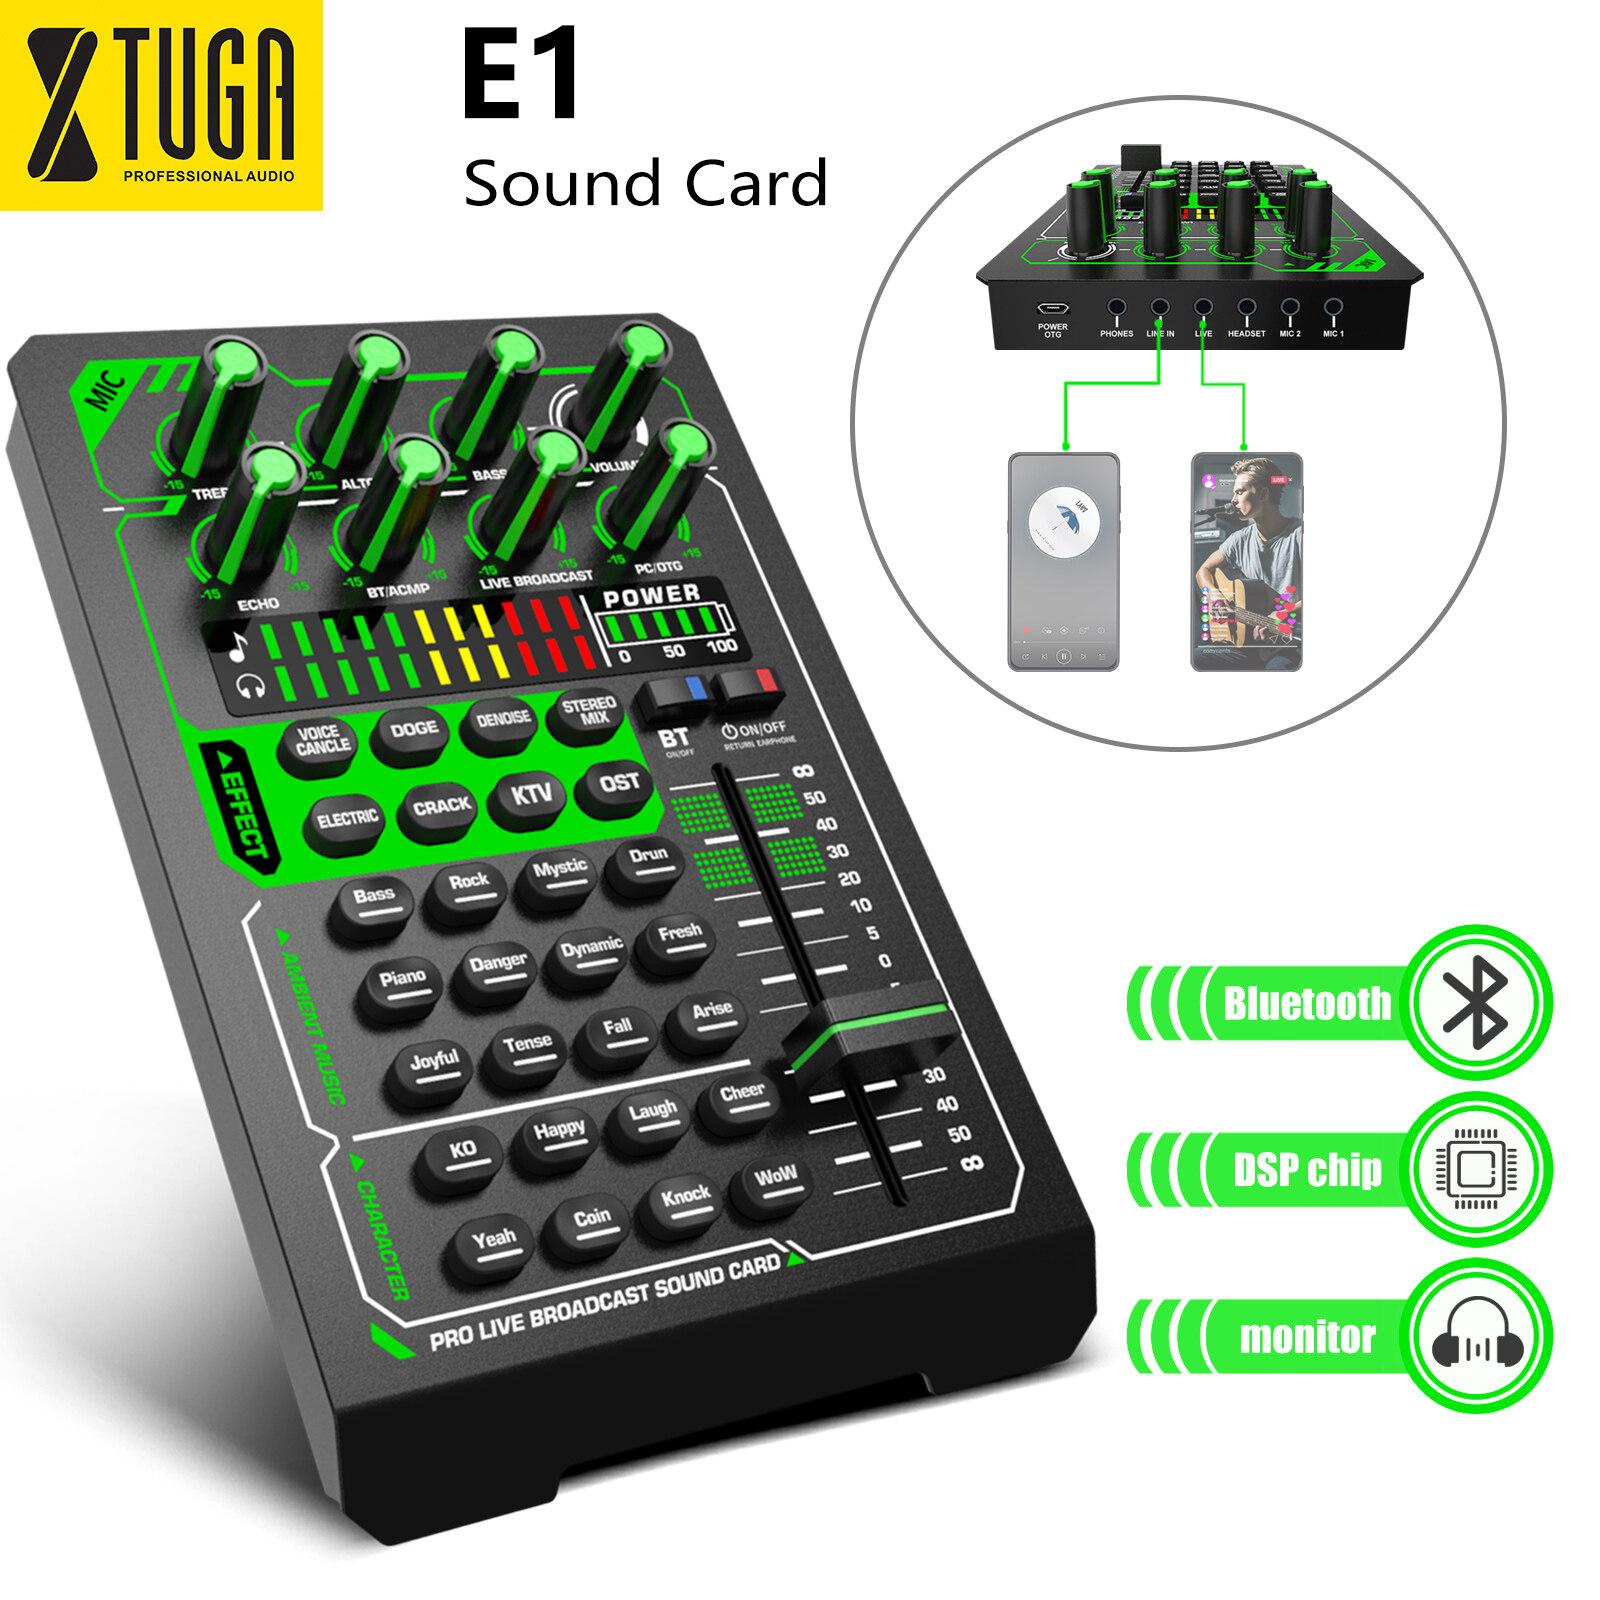 Xtuga E1 บลูทู ธ Live Sound Card ชุดอินเทอร์เฟซชุดหูฟังภายนอกไมโครโฟนสเตอริโอสำหรับโทรศัพท์ Pc Youtube Tik-Tok Live Record.